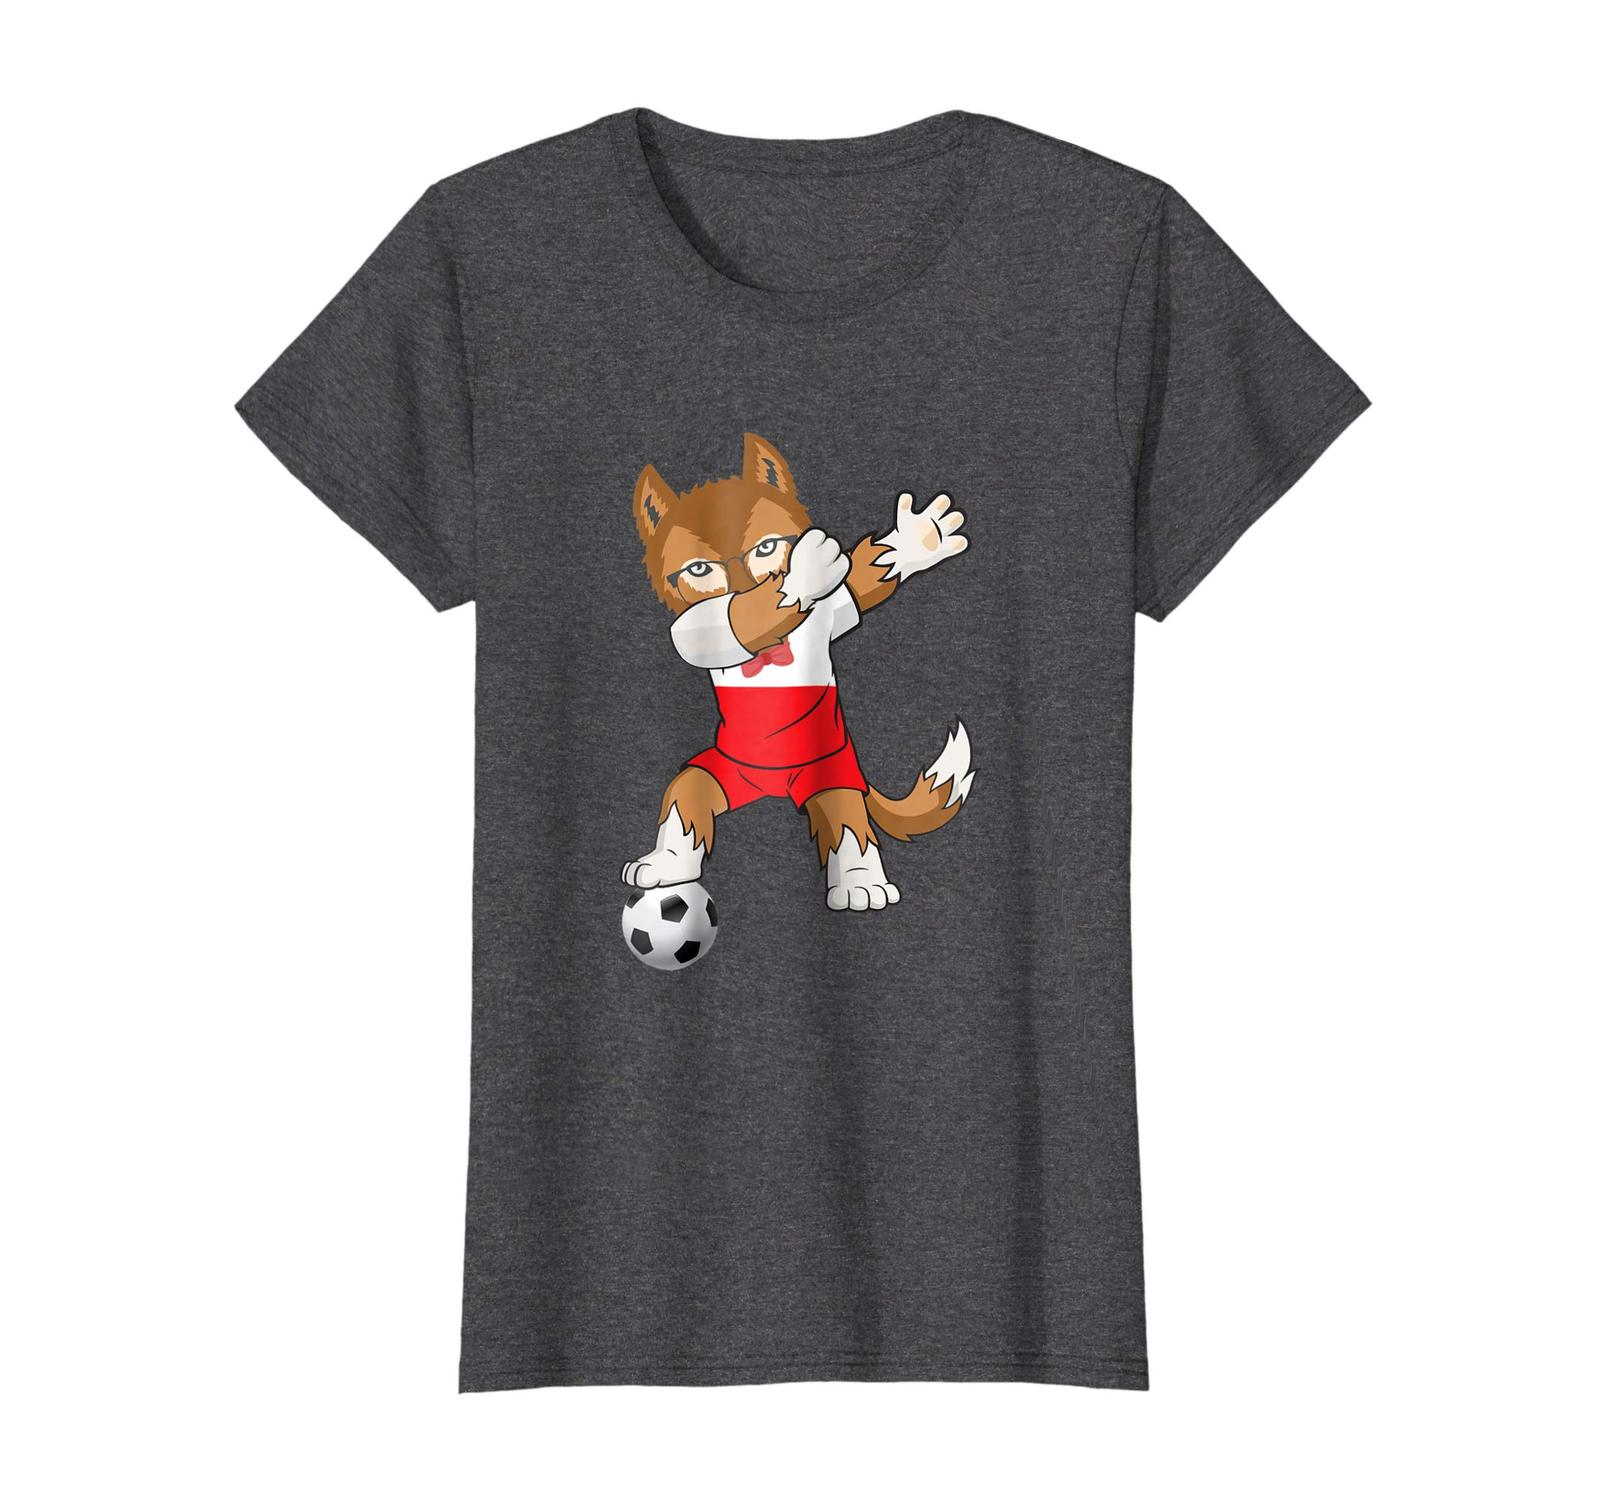 Brother Shirts - Poland Soccer Jersey 2018 World Football Cup T-Shirt Flag Wowen